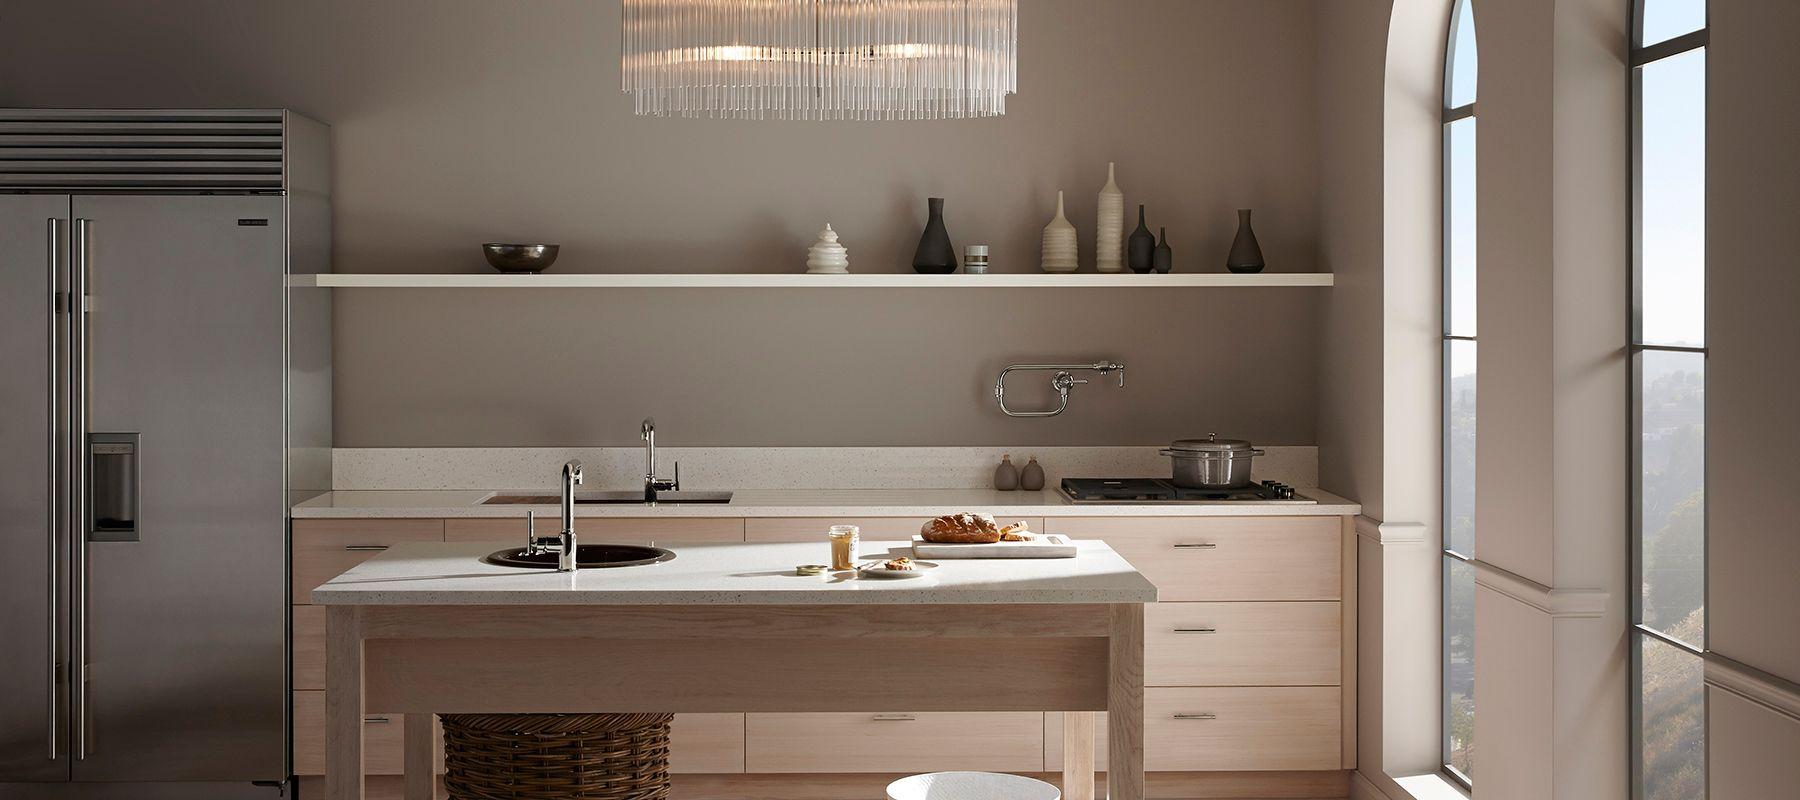 Apron Front Kitchen Sinks Kitchen Kohler